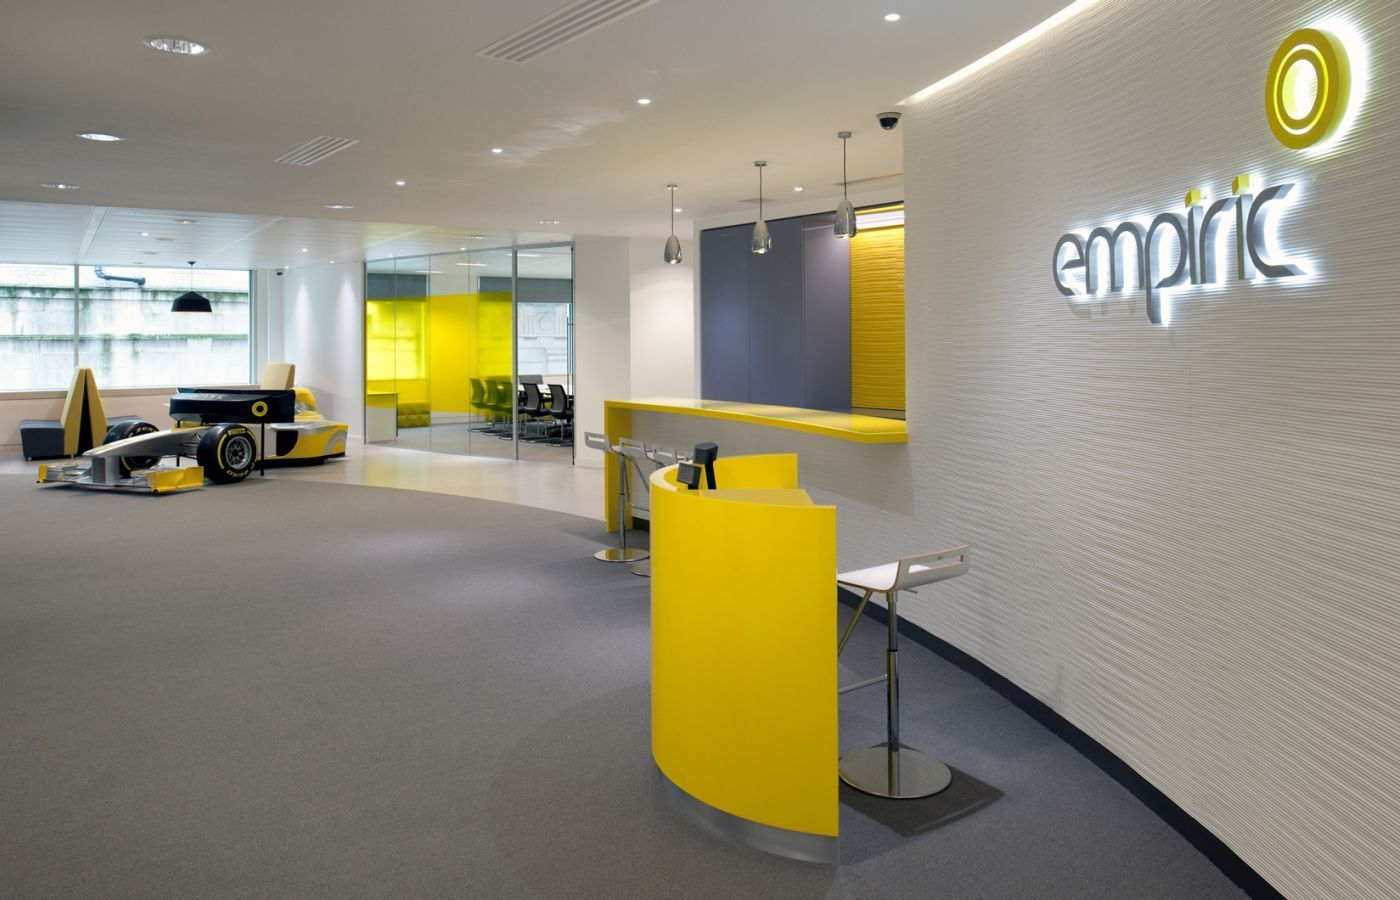 inspirational office. Inspirational Office Design | Gallery F